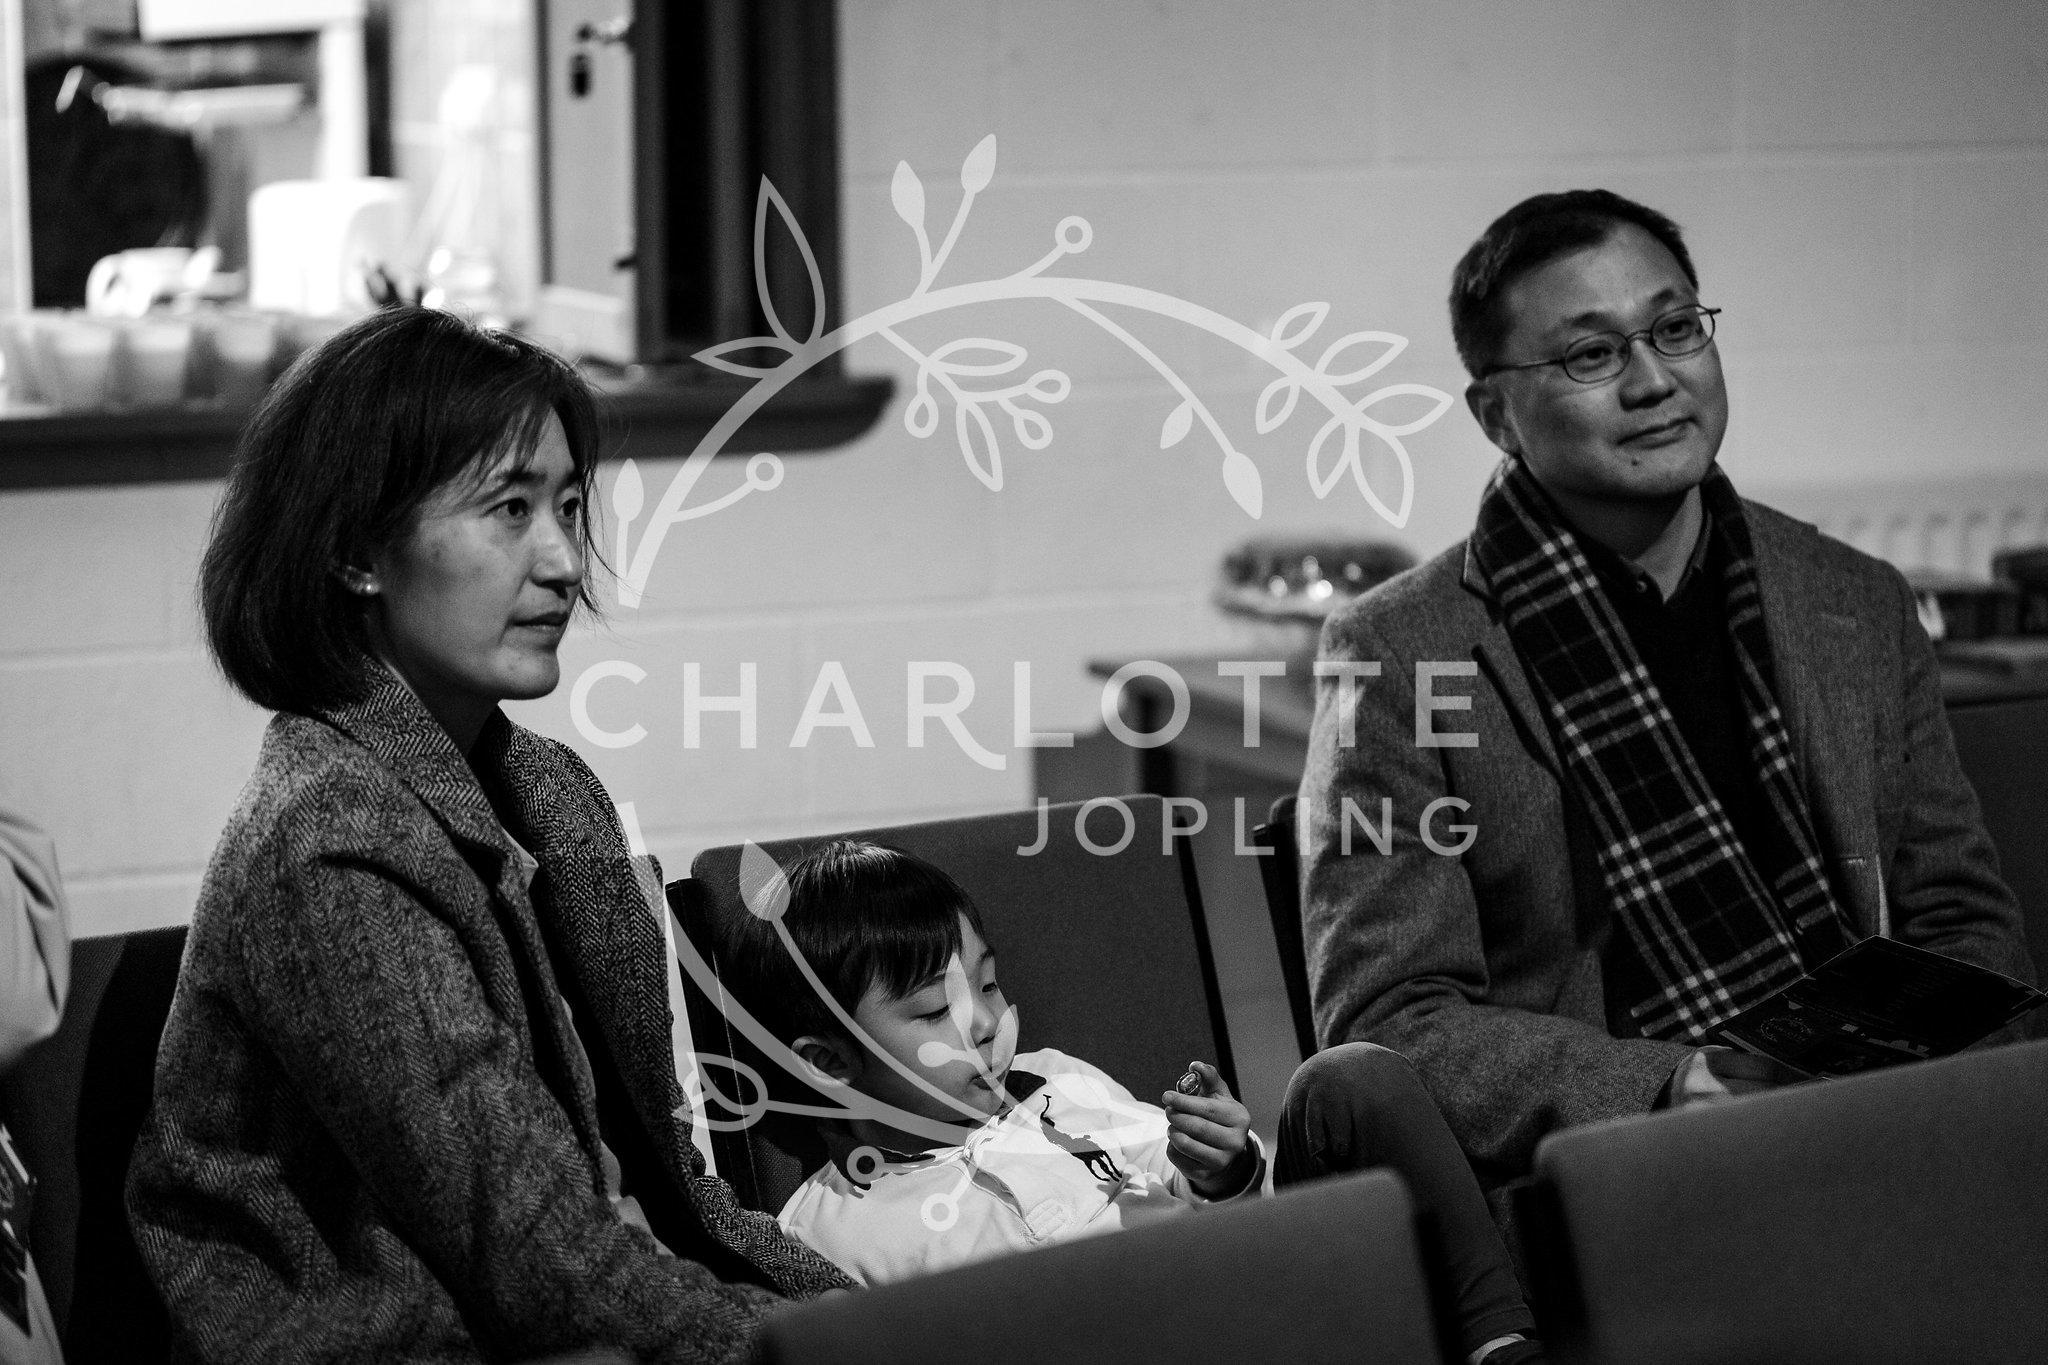 Stepping-Stones-Voicebox-Concert-2018-by-Charlotte-Jopling-32.jpg